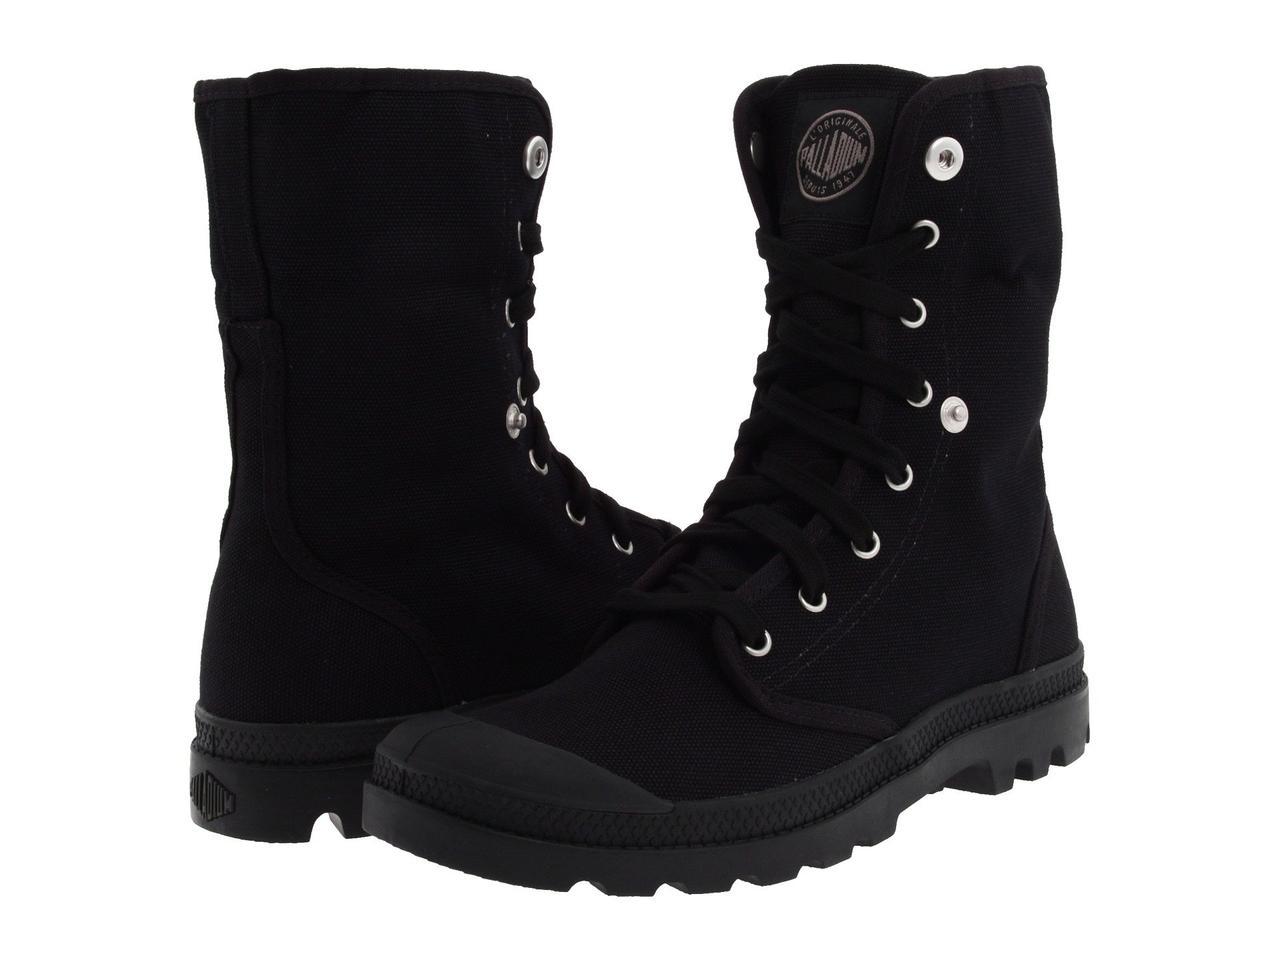 Ботинки Сапоги (Оригинал) Palladium Baggy Black Black - TopUSA